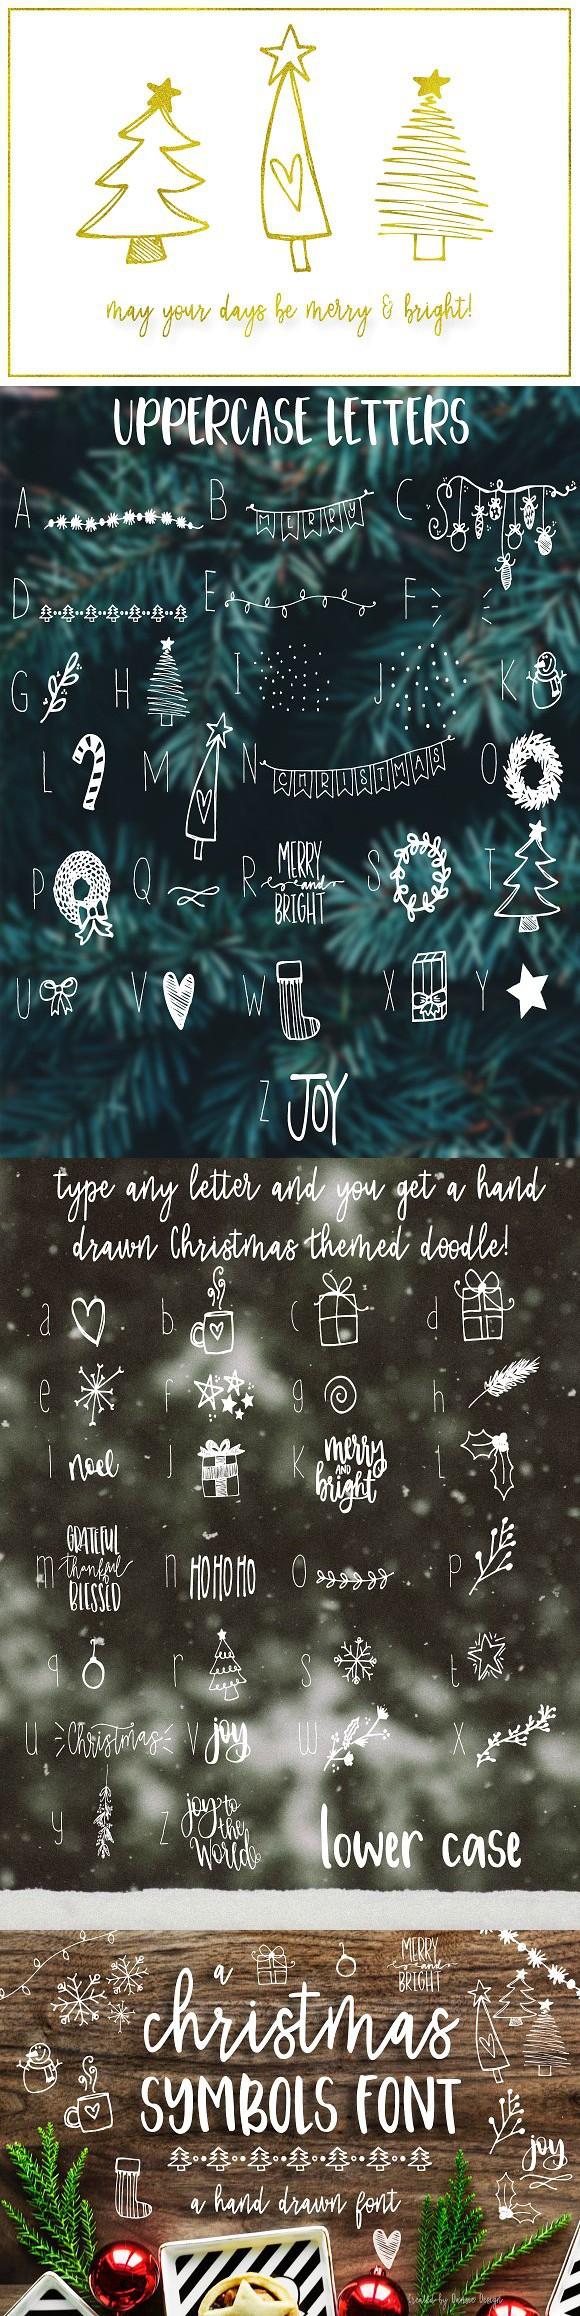 Christmas symbols font cute fonts letter pinterest fonts christmas symbols font cute fonts biocorpaavc Images